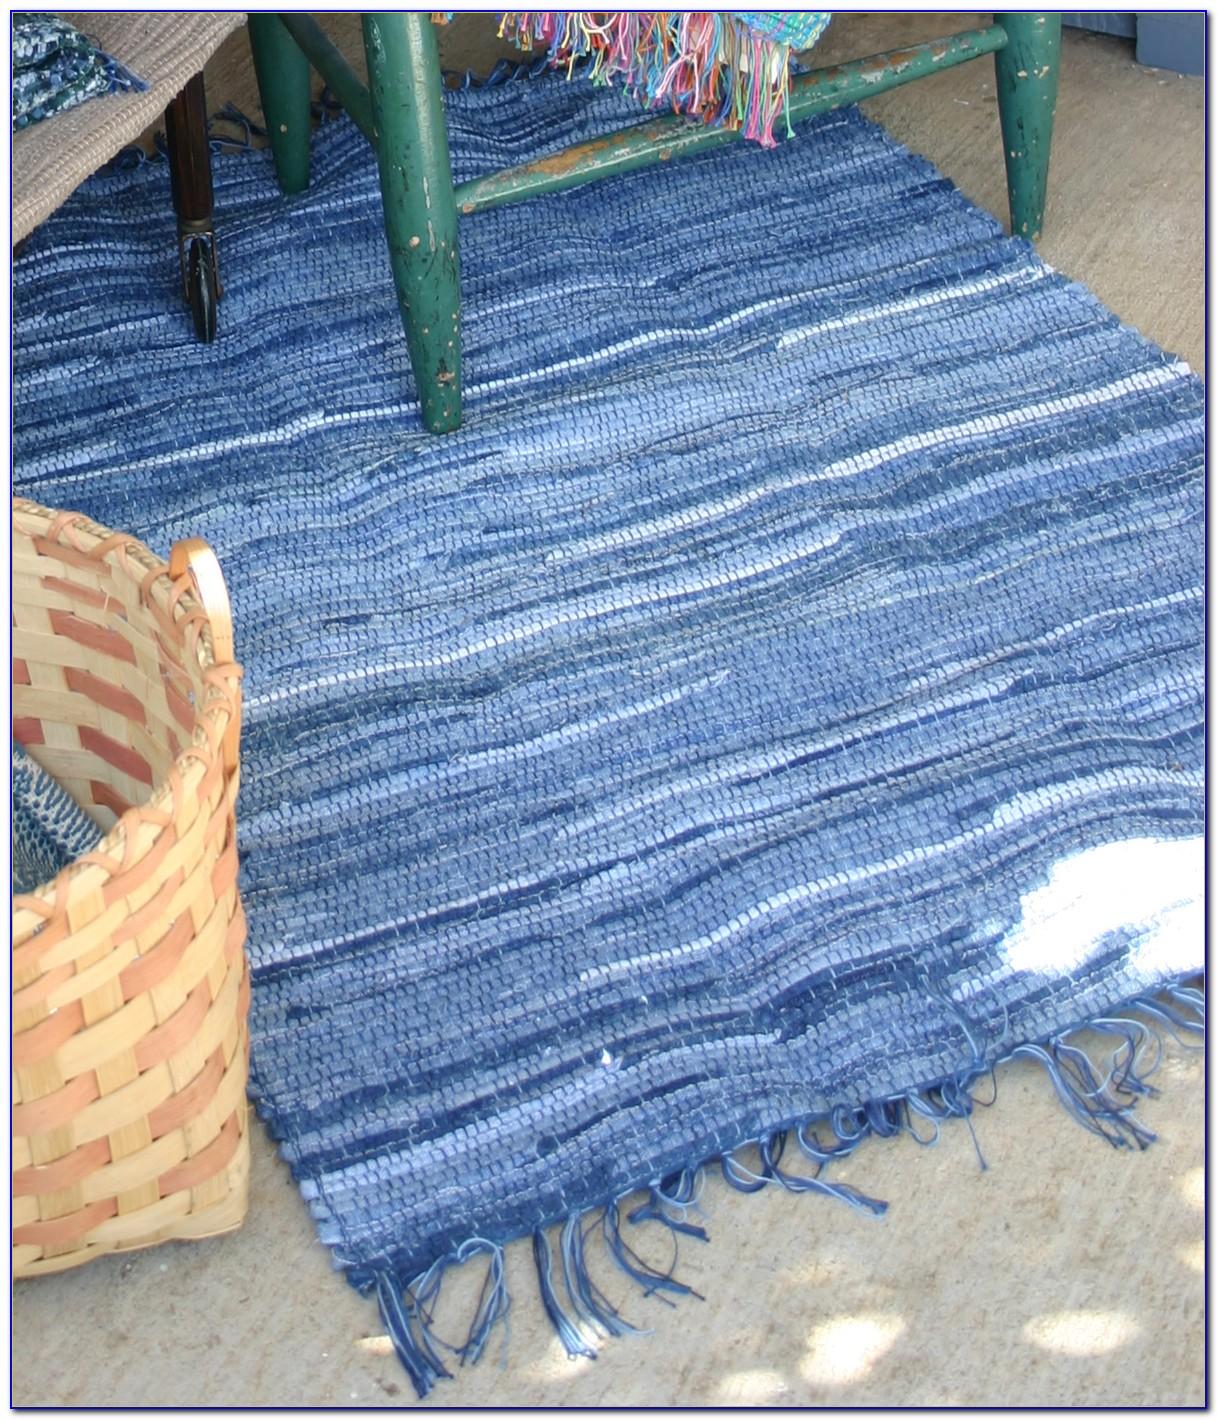 Denim Rag Rug Weaving